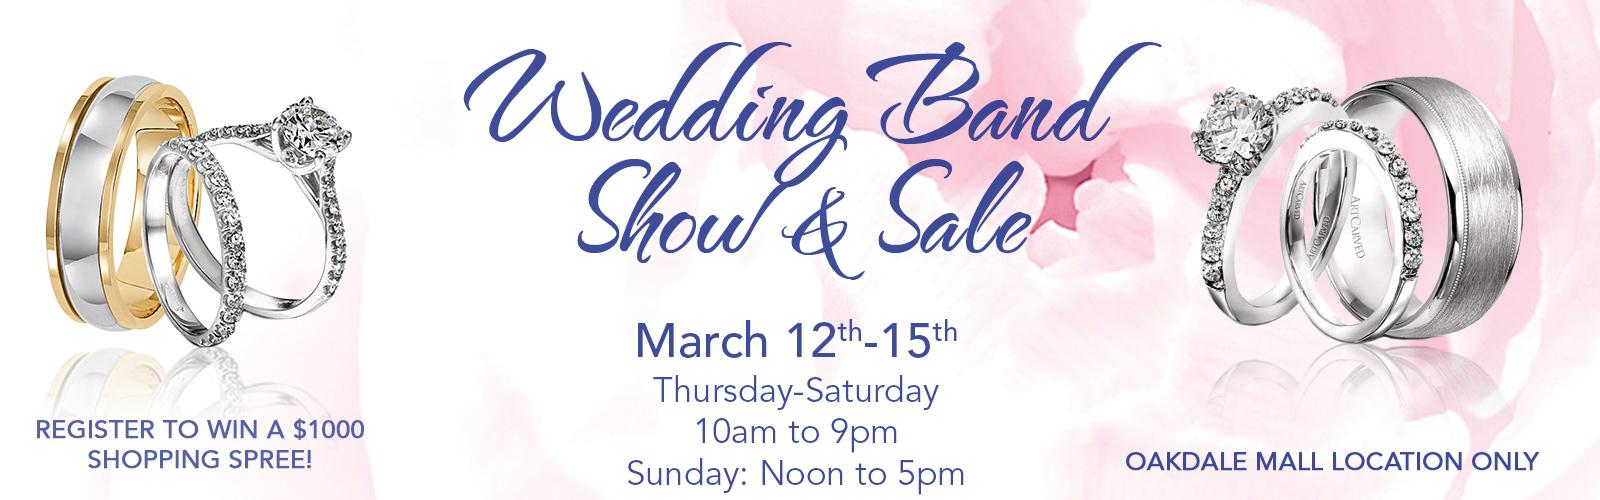 Wedding Band Show & Sale